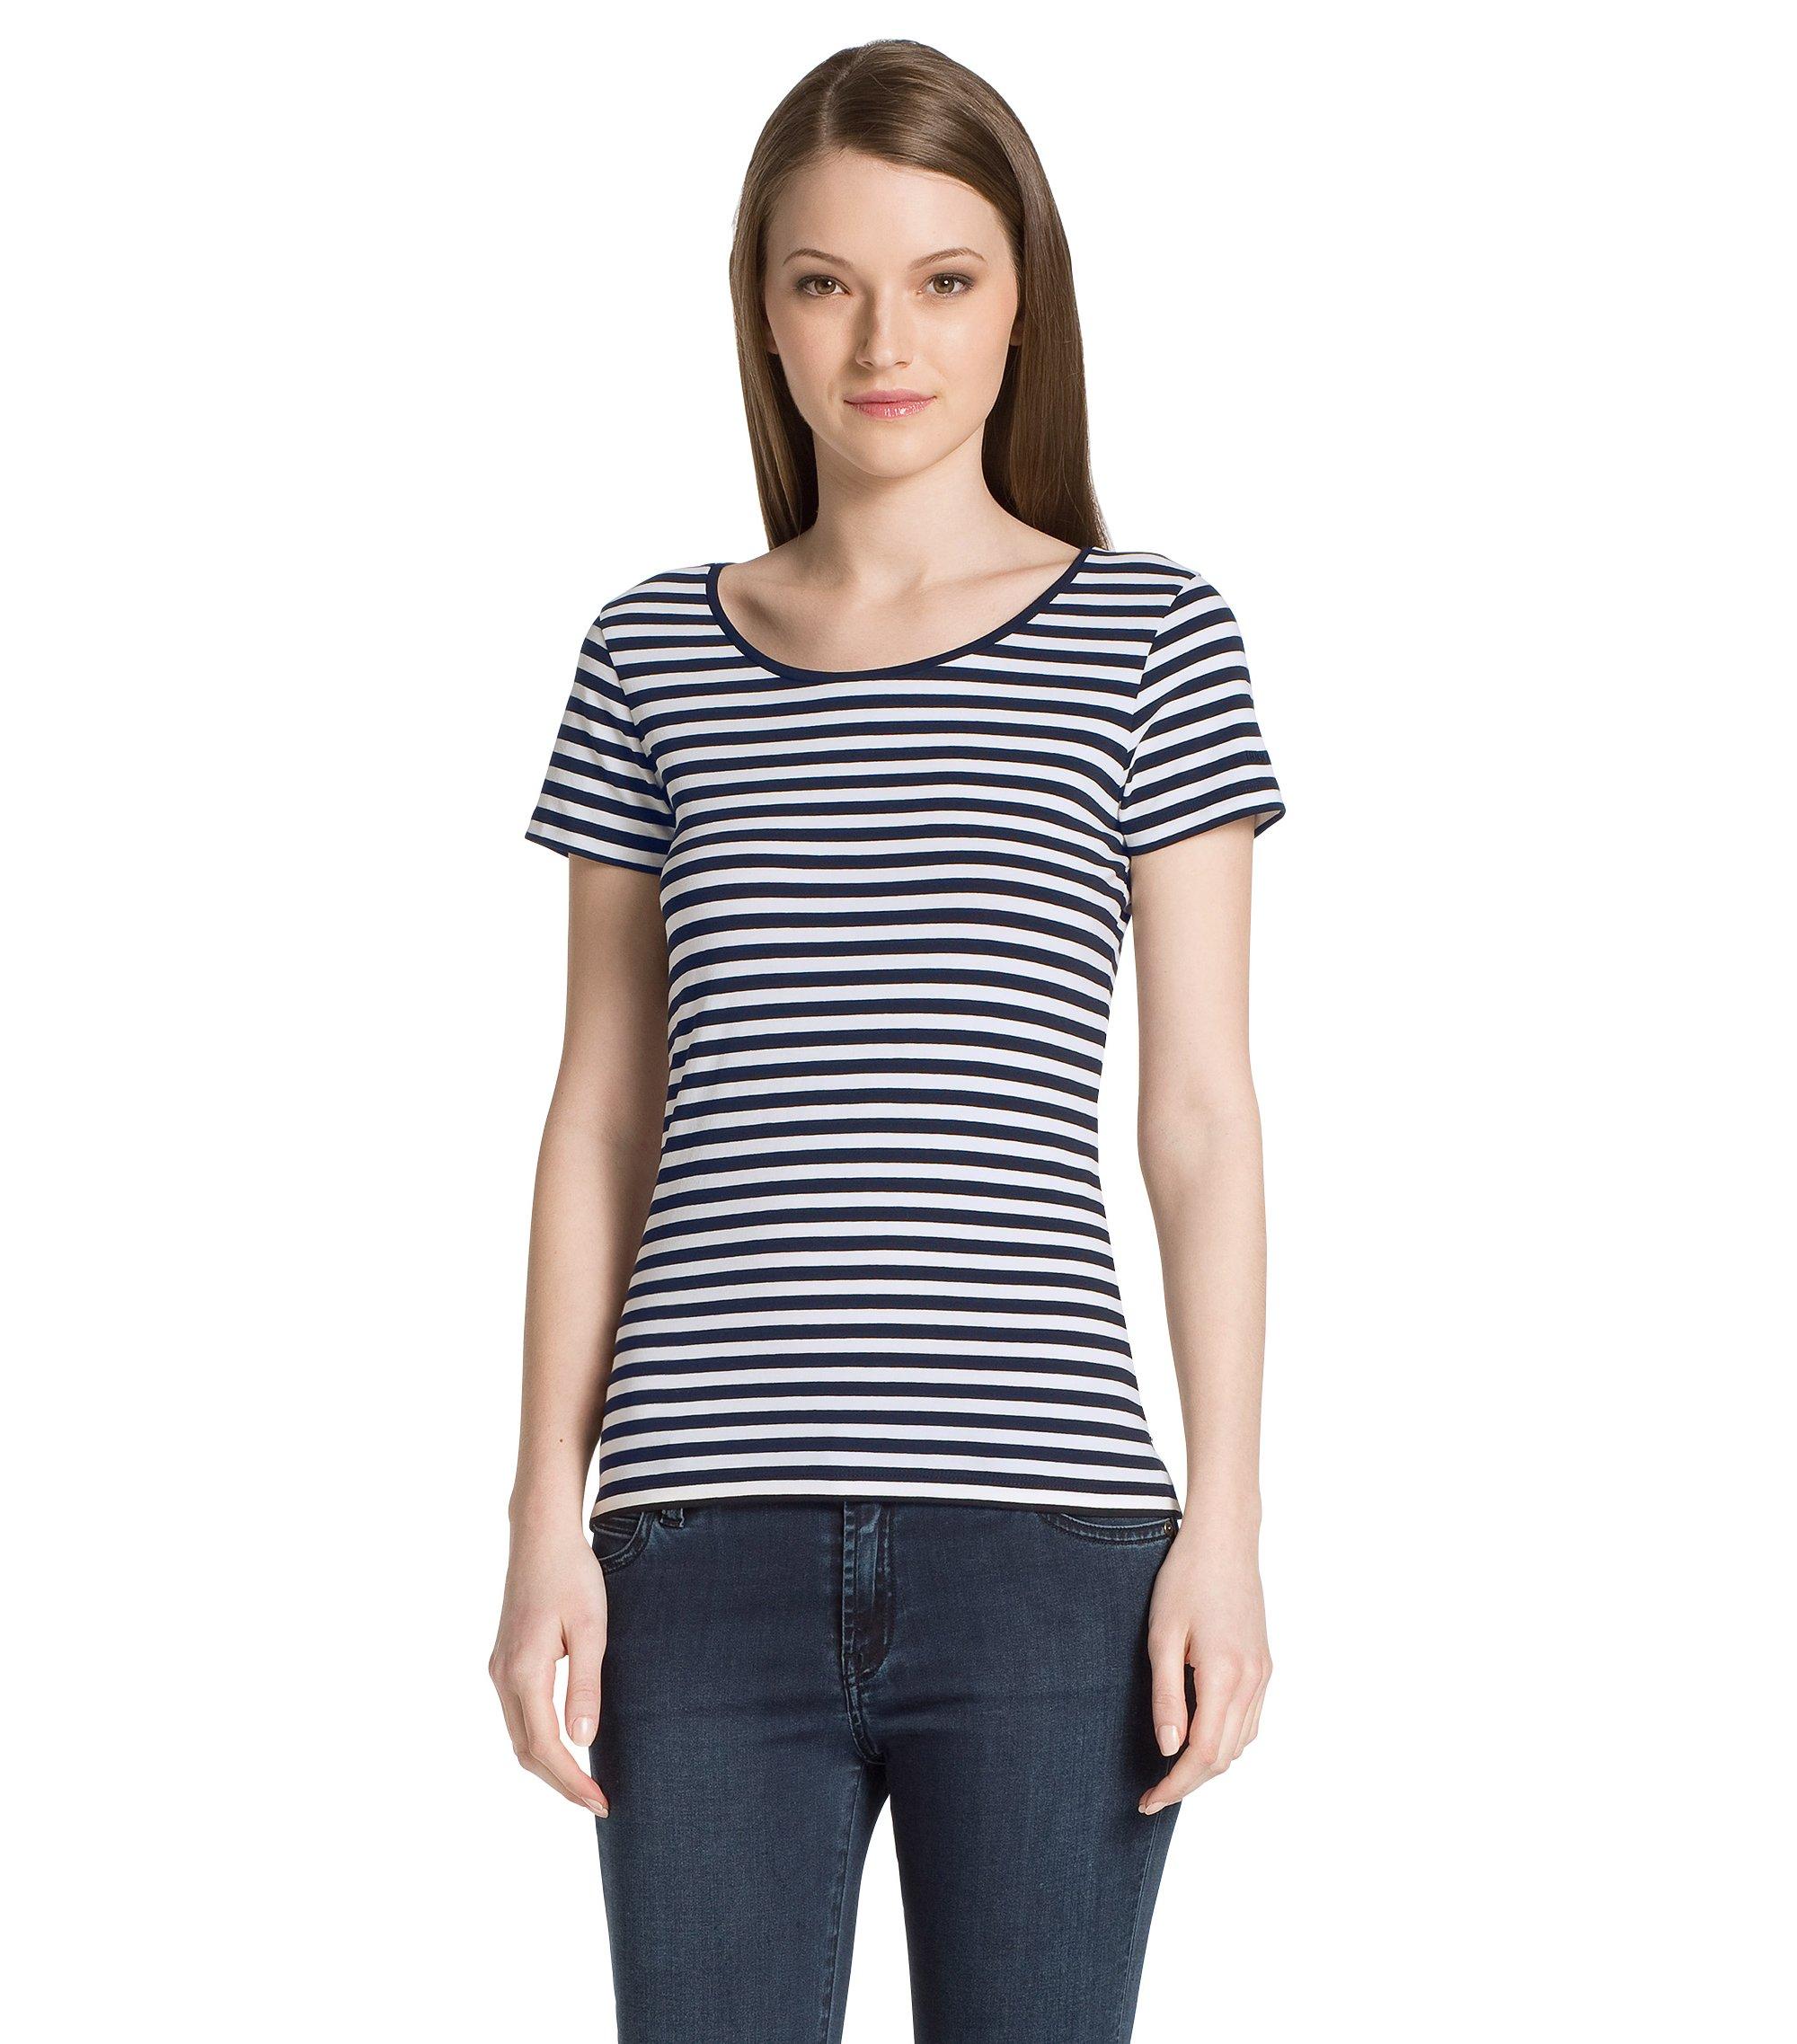 T-Shirt ´Debia_2` aus Baumwoll-Mix, Gemustert